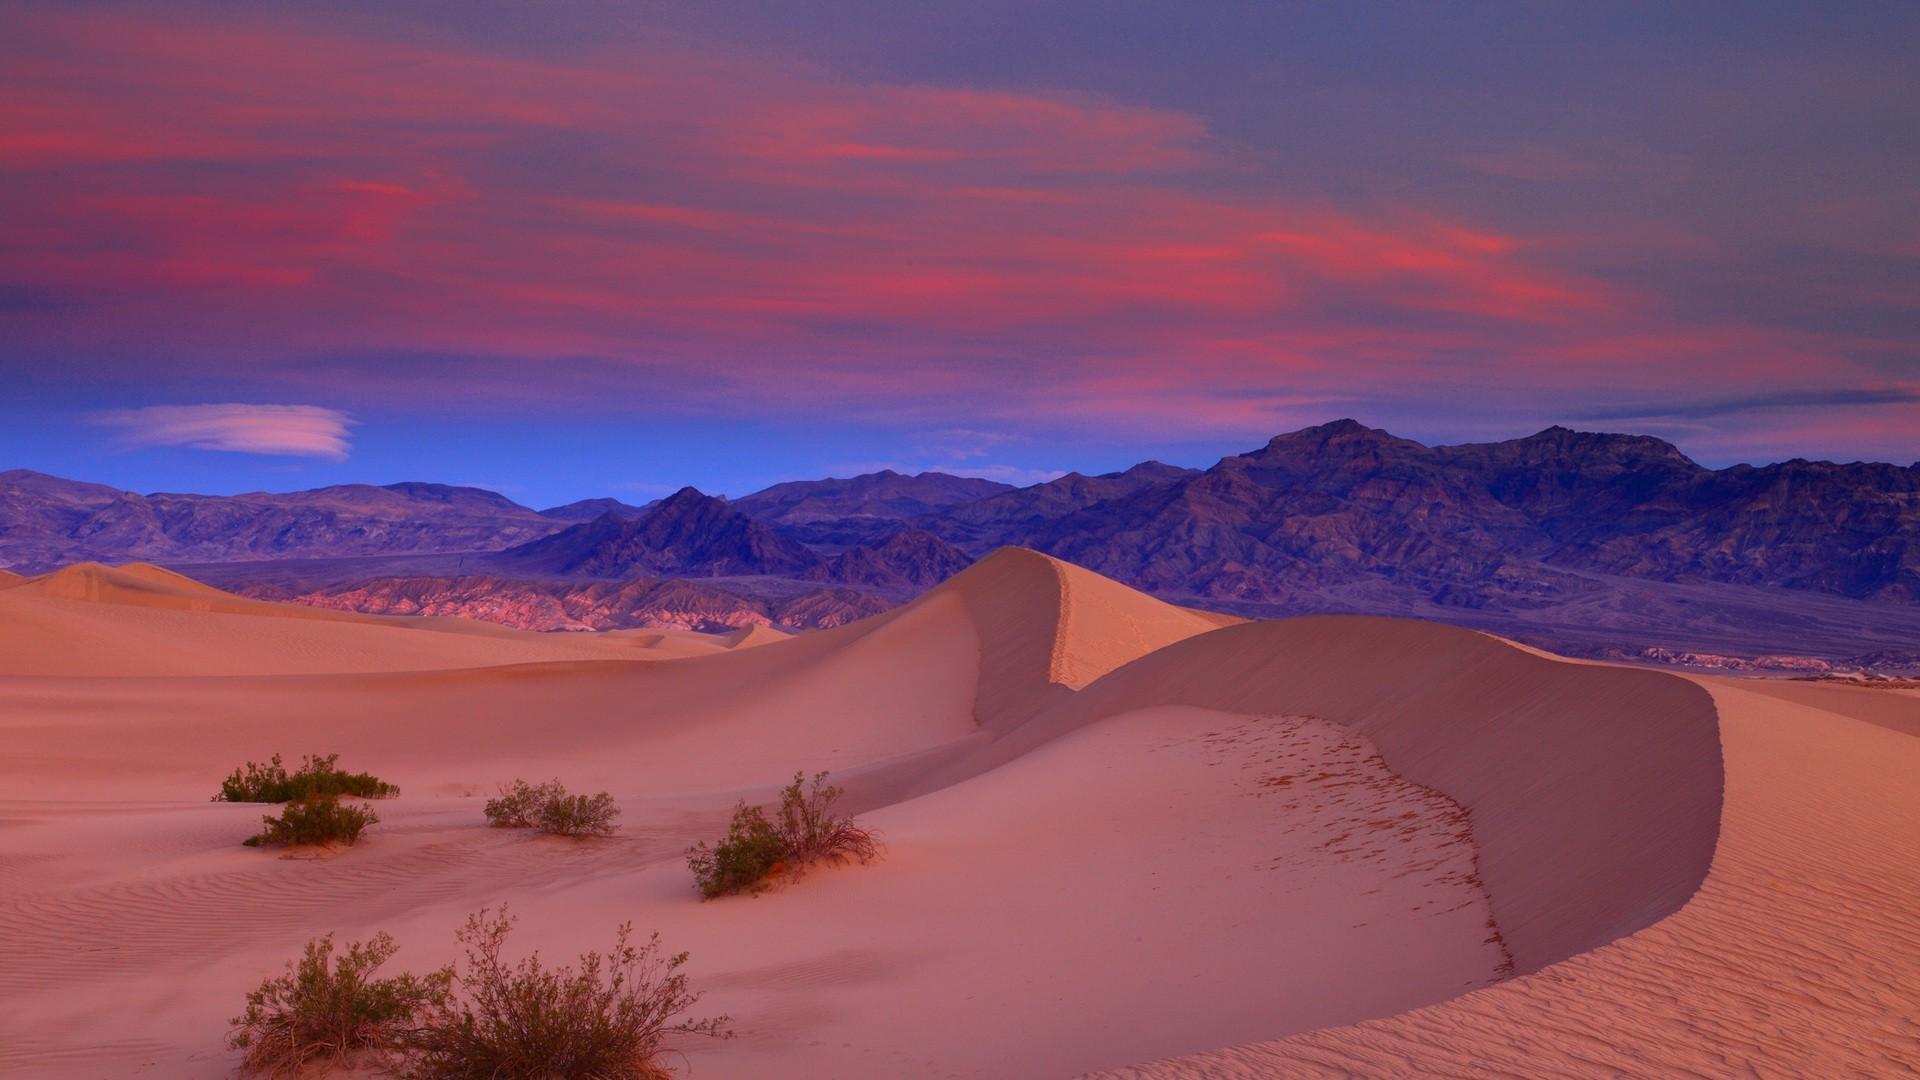 1920x1080 Px California Clouds Death Valley Desert Dune Landscape Mountain Nature Plants Sand Sunset USA